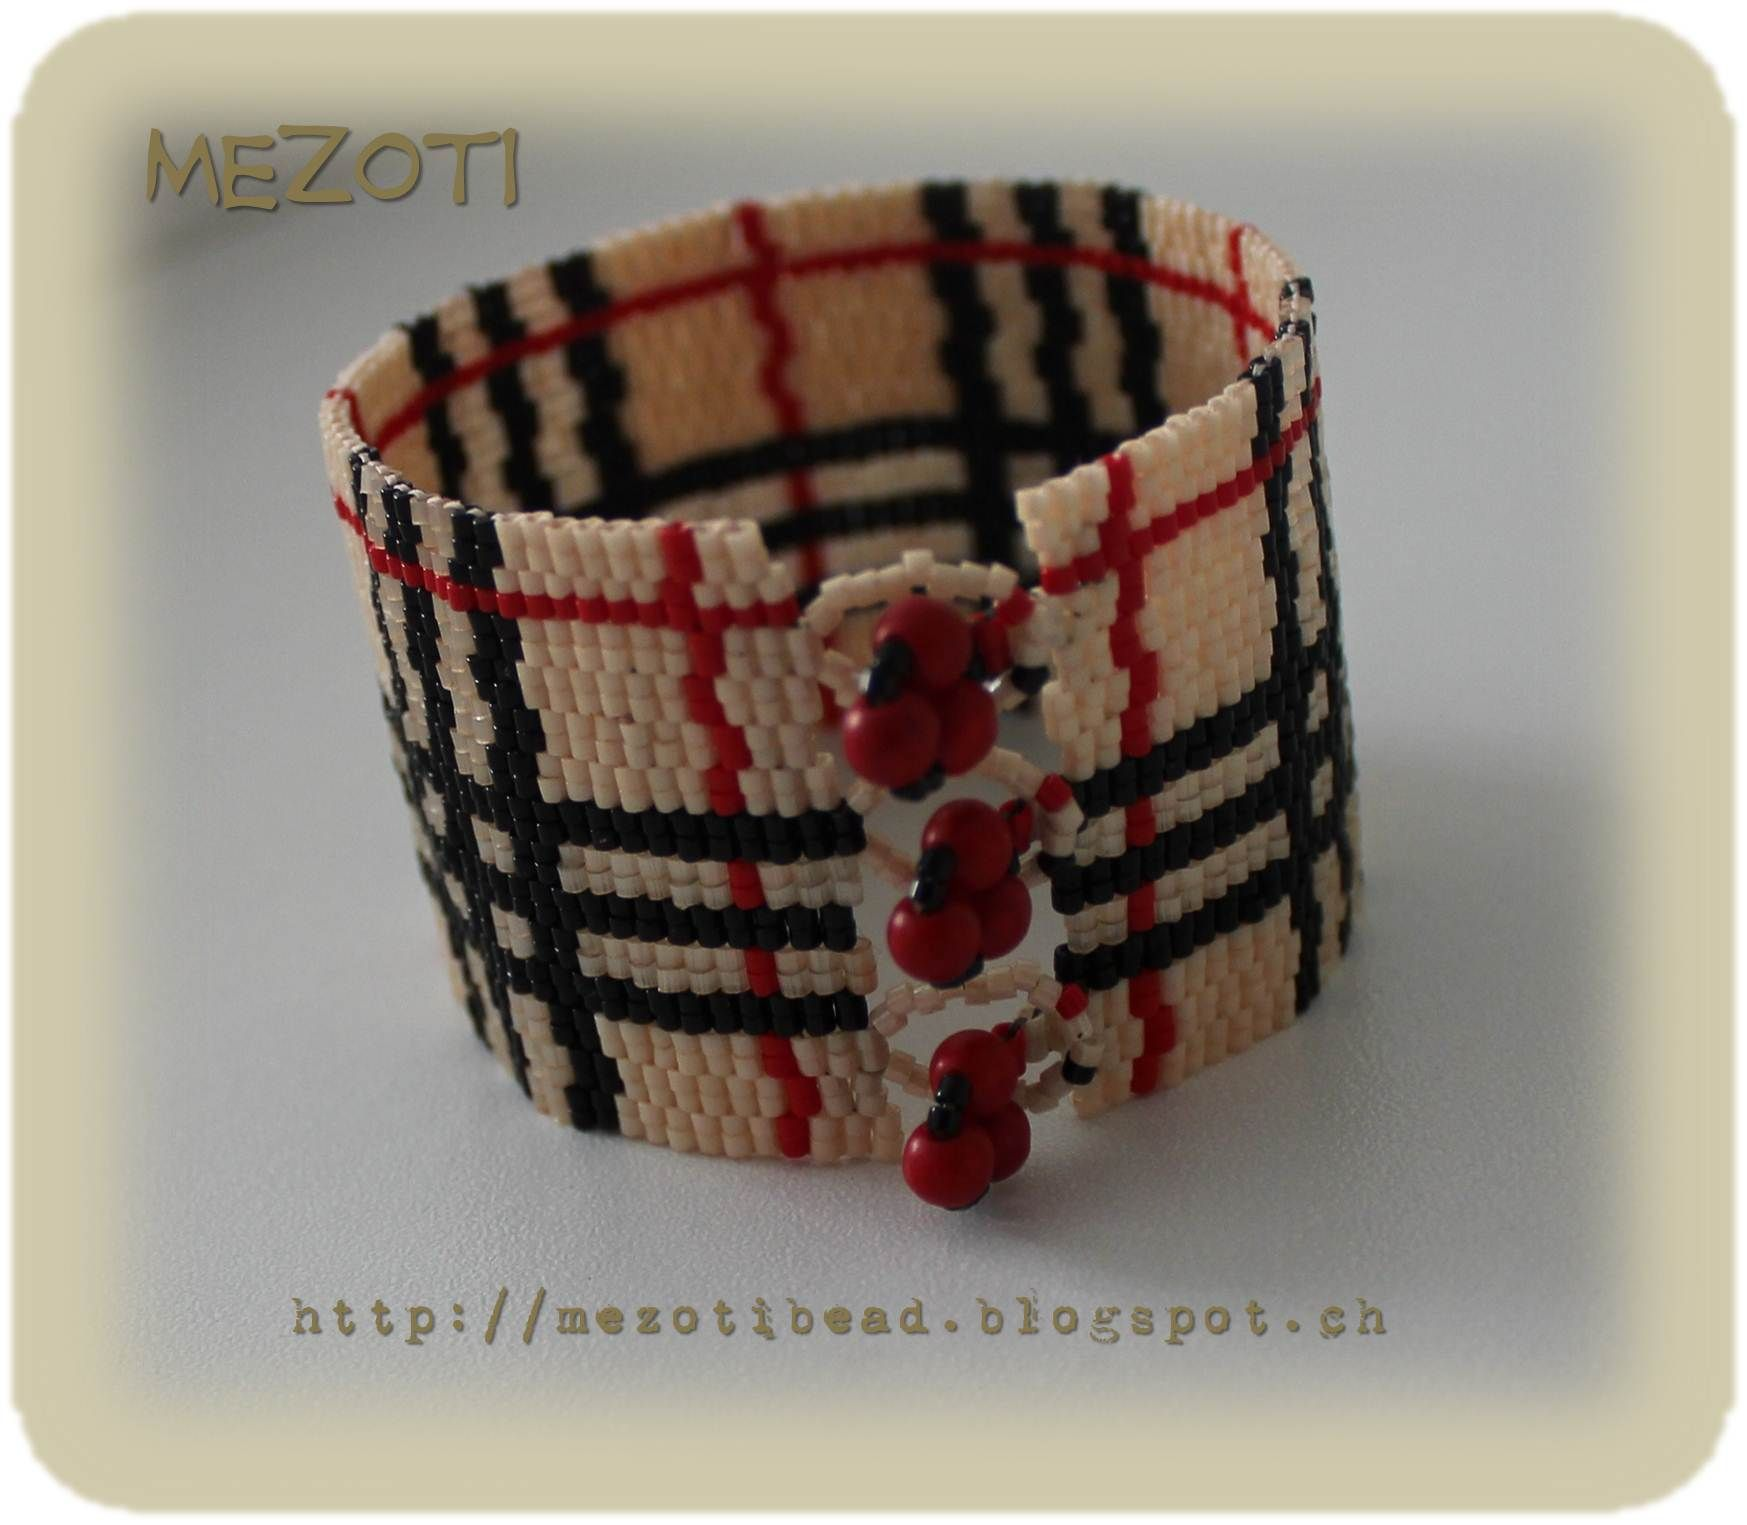 Armband / Bracelet Made by Mezoti Bead 3500 X Miyuki Delica Beads + Korallenperlen + Herz & Seele / Heart & Soul